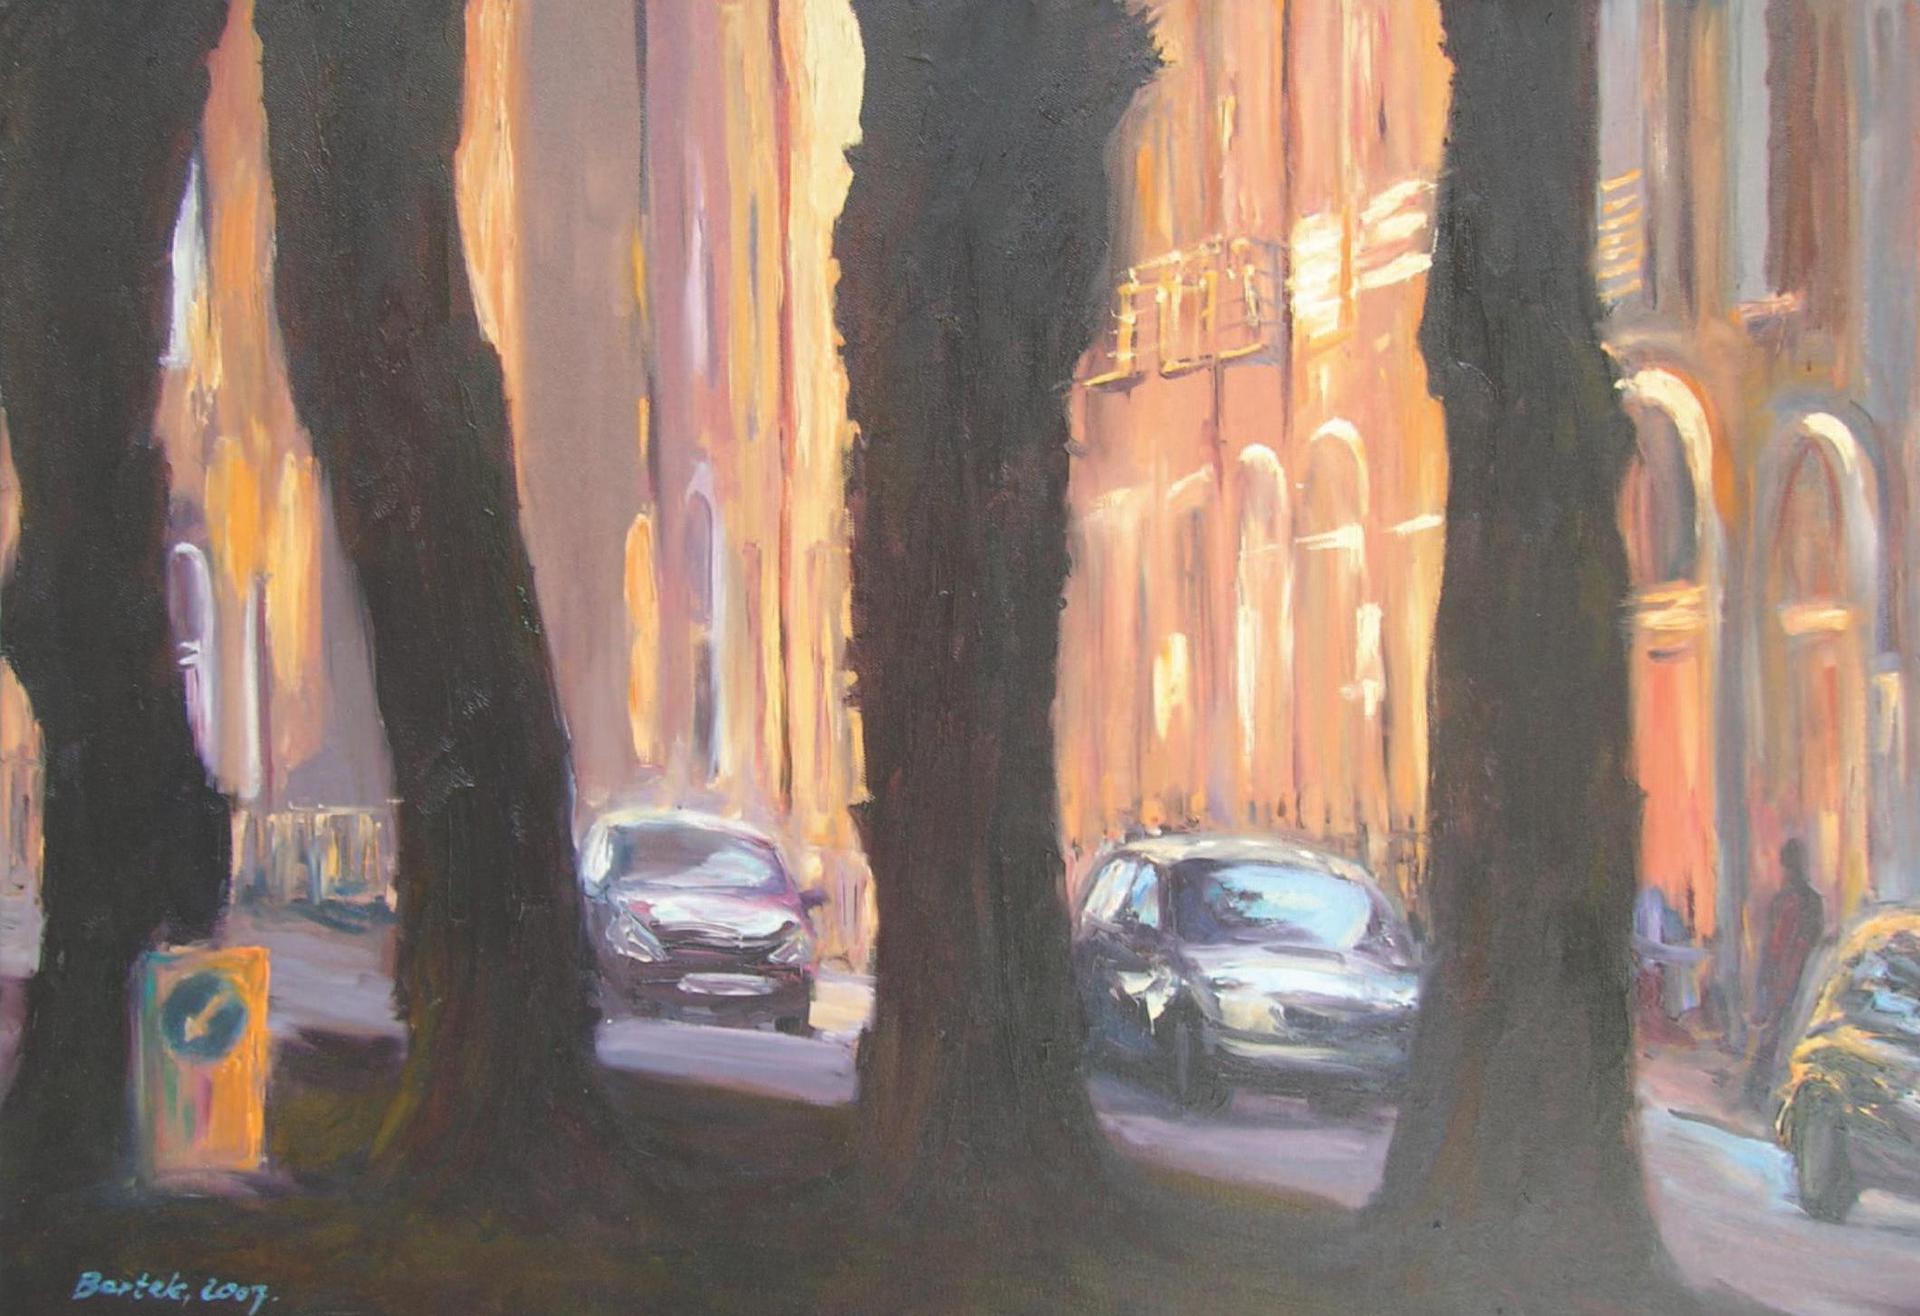 Baggot Street - The Trees (50x70)